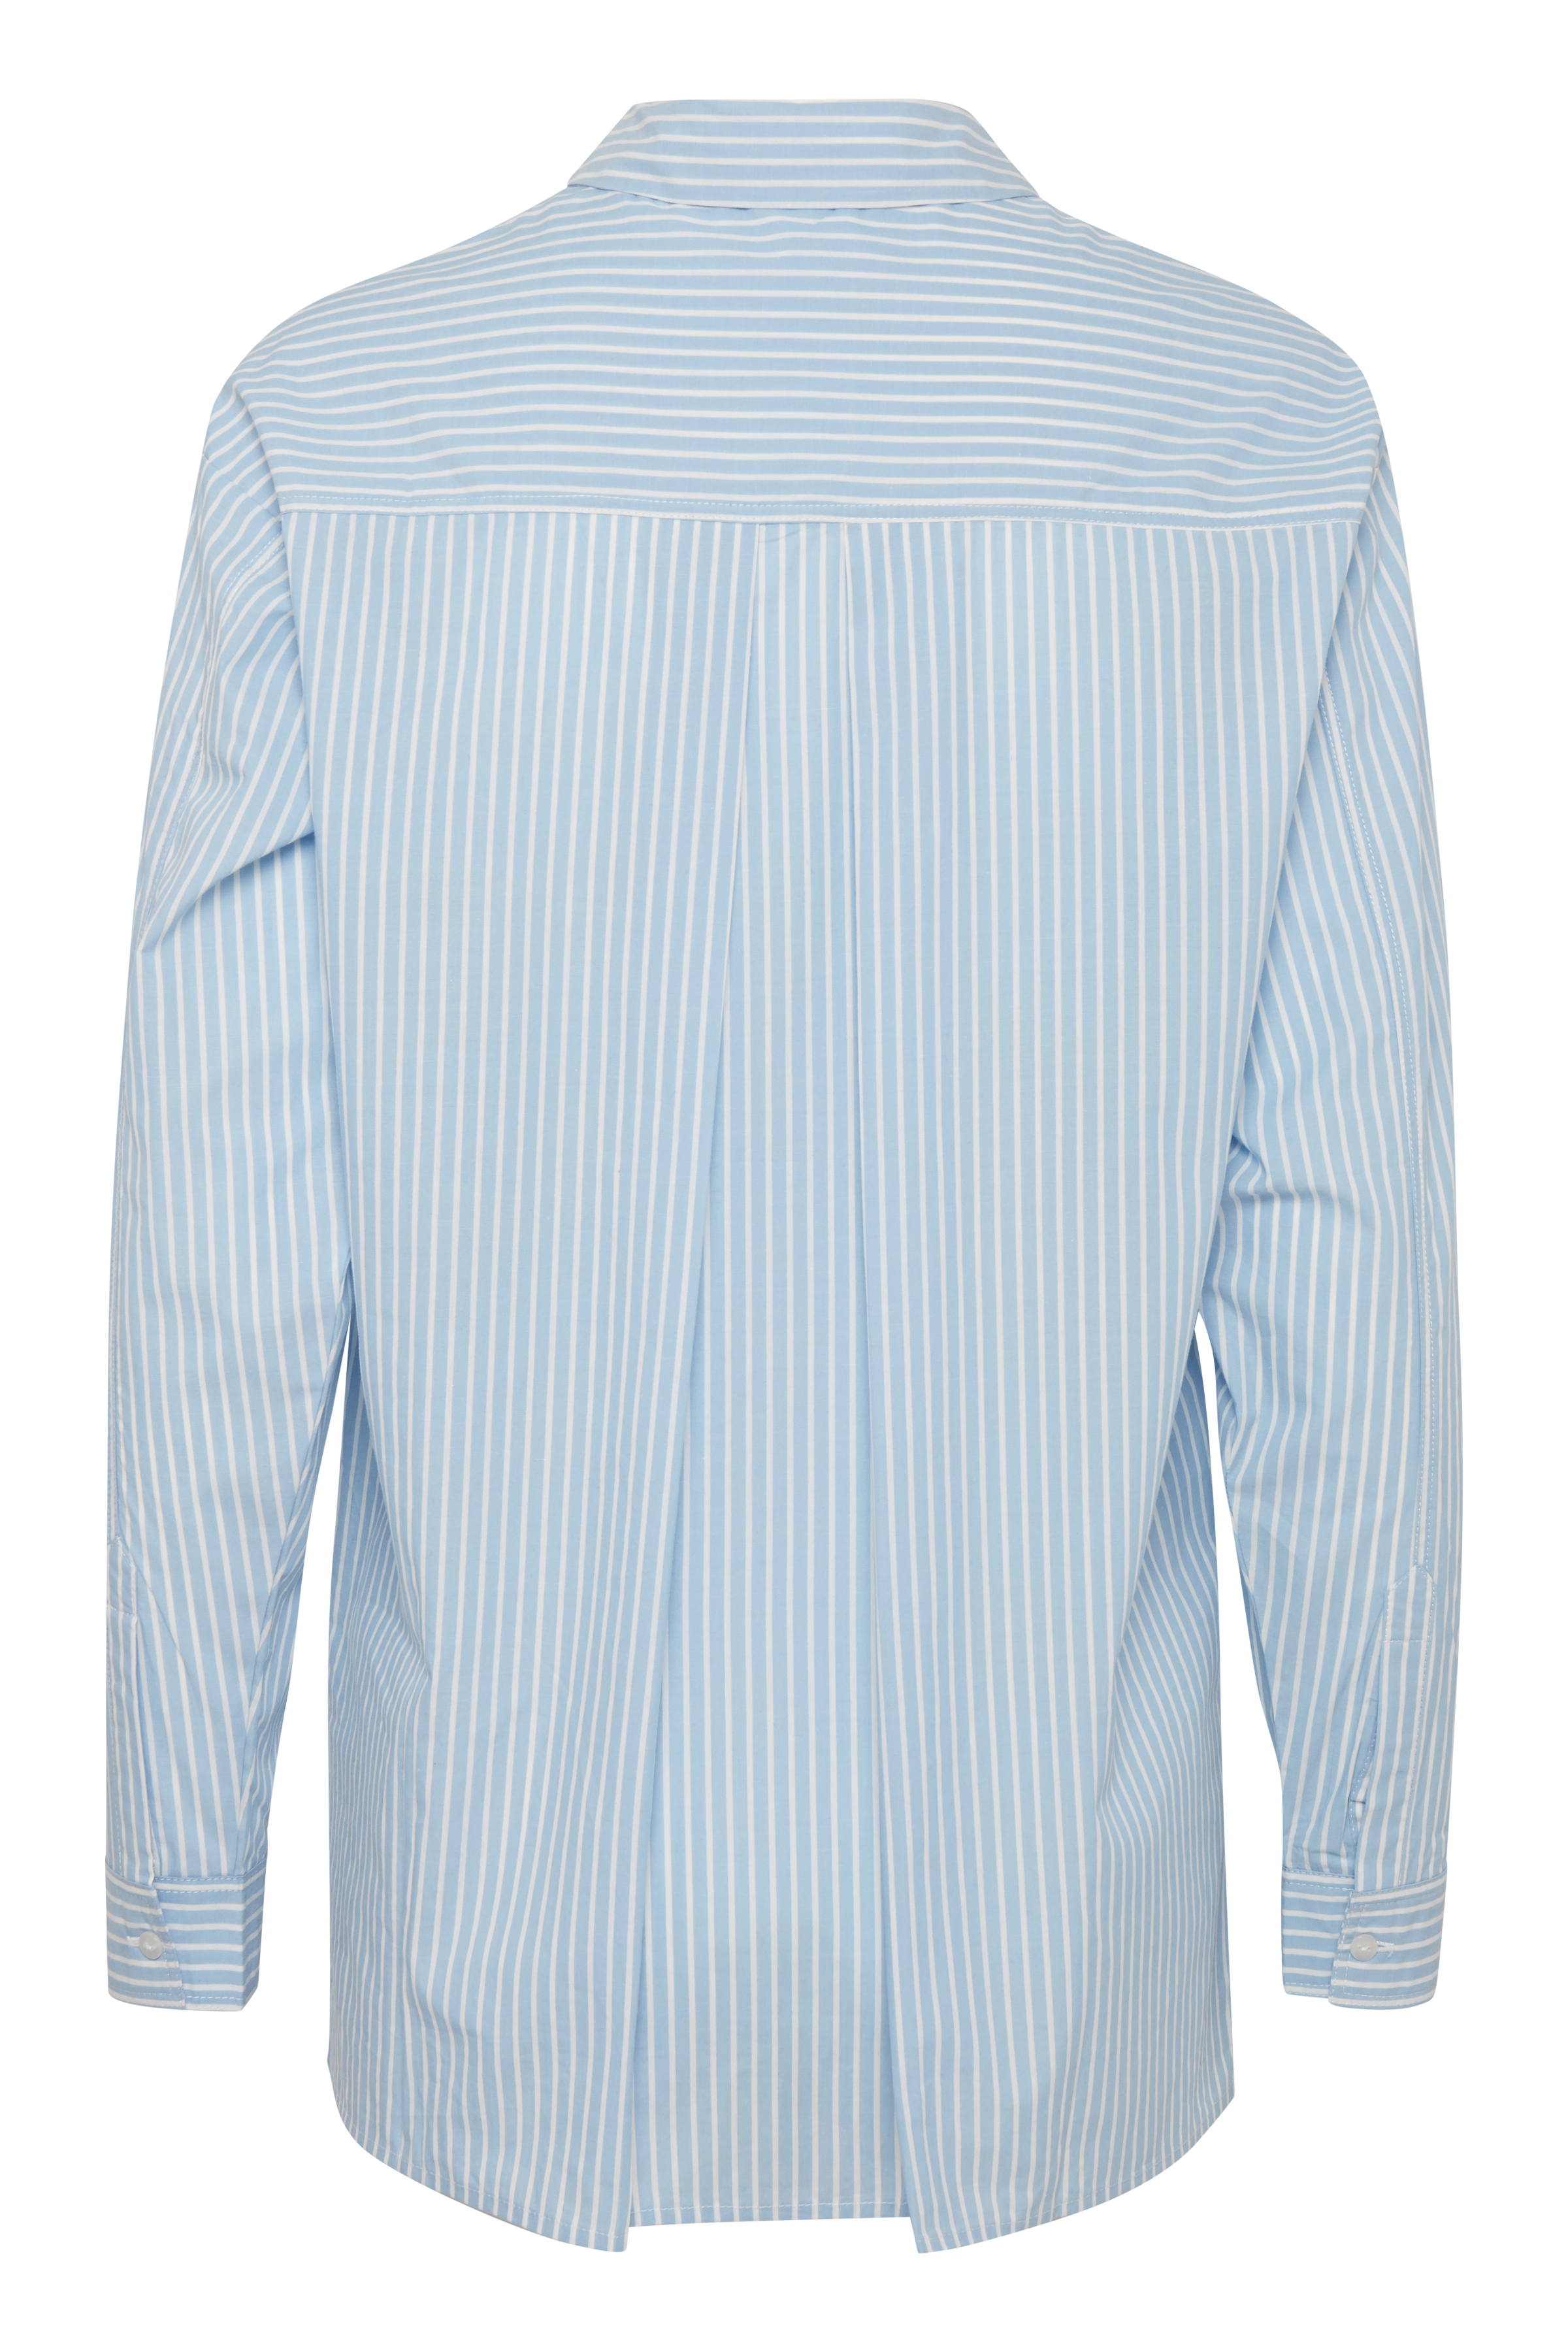 Azure Blue As Sms Langærmet skjorte – Køb Azure Blue As Sms Langærmet skjorte fra str. XS-XXL her